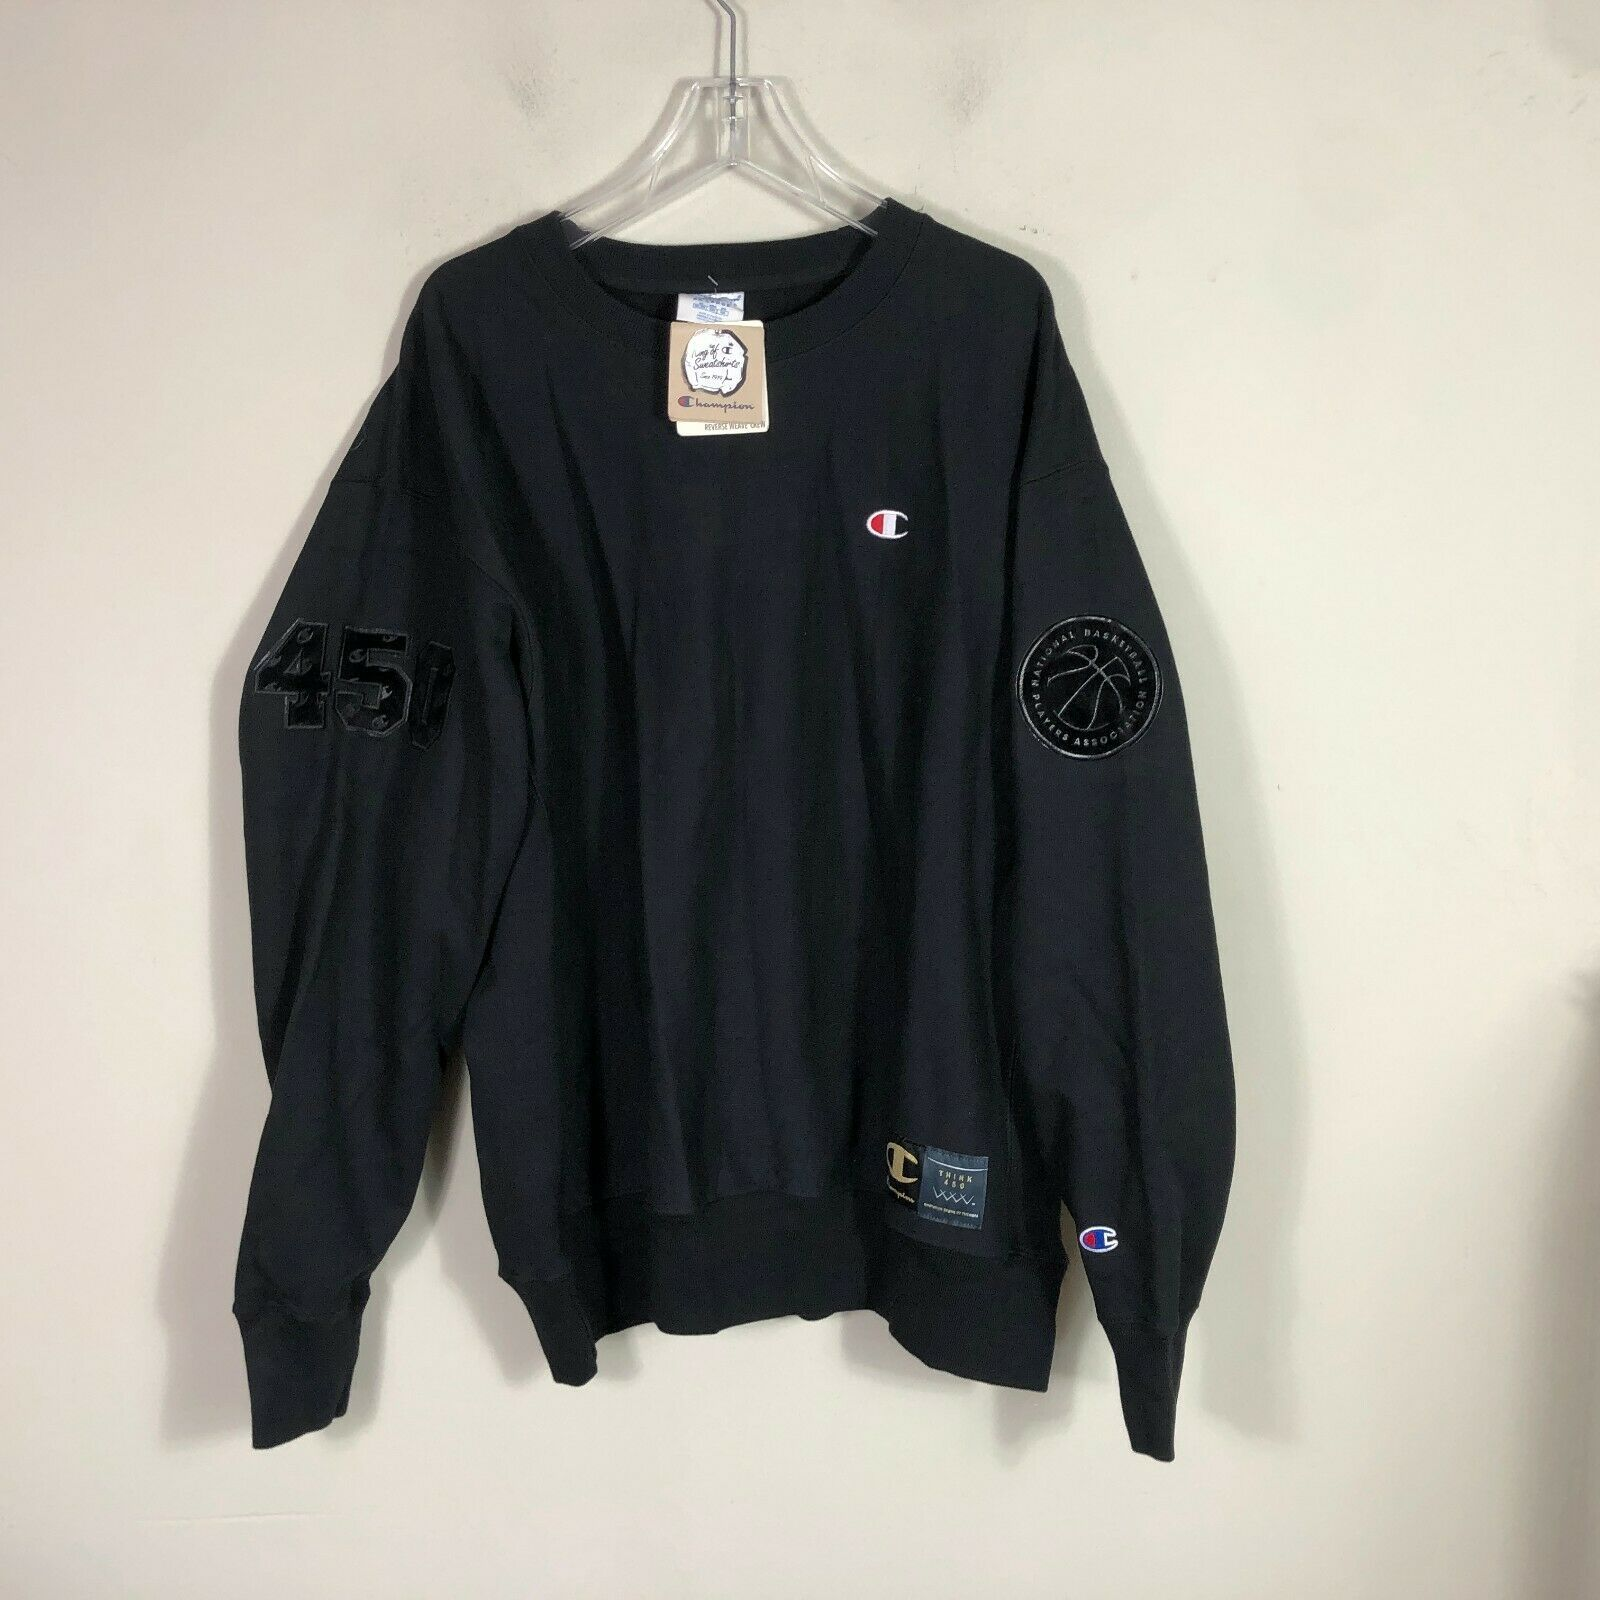 Vintage Champion Crew Neck Reverse Weave Sweatshirt 2XL NBA NBPA Sweatshirt NWT image 4